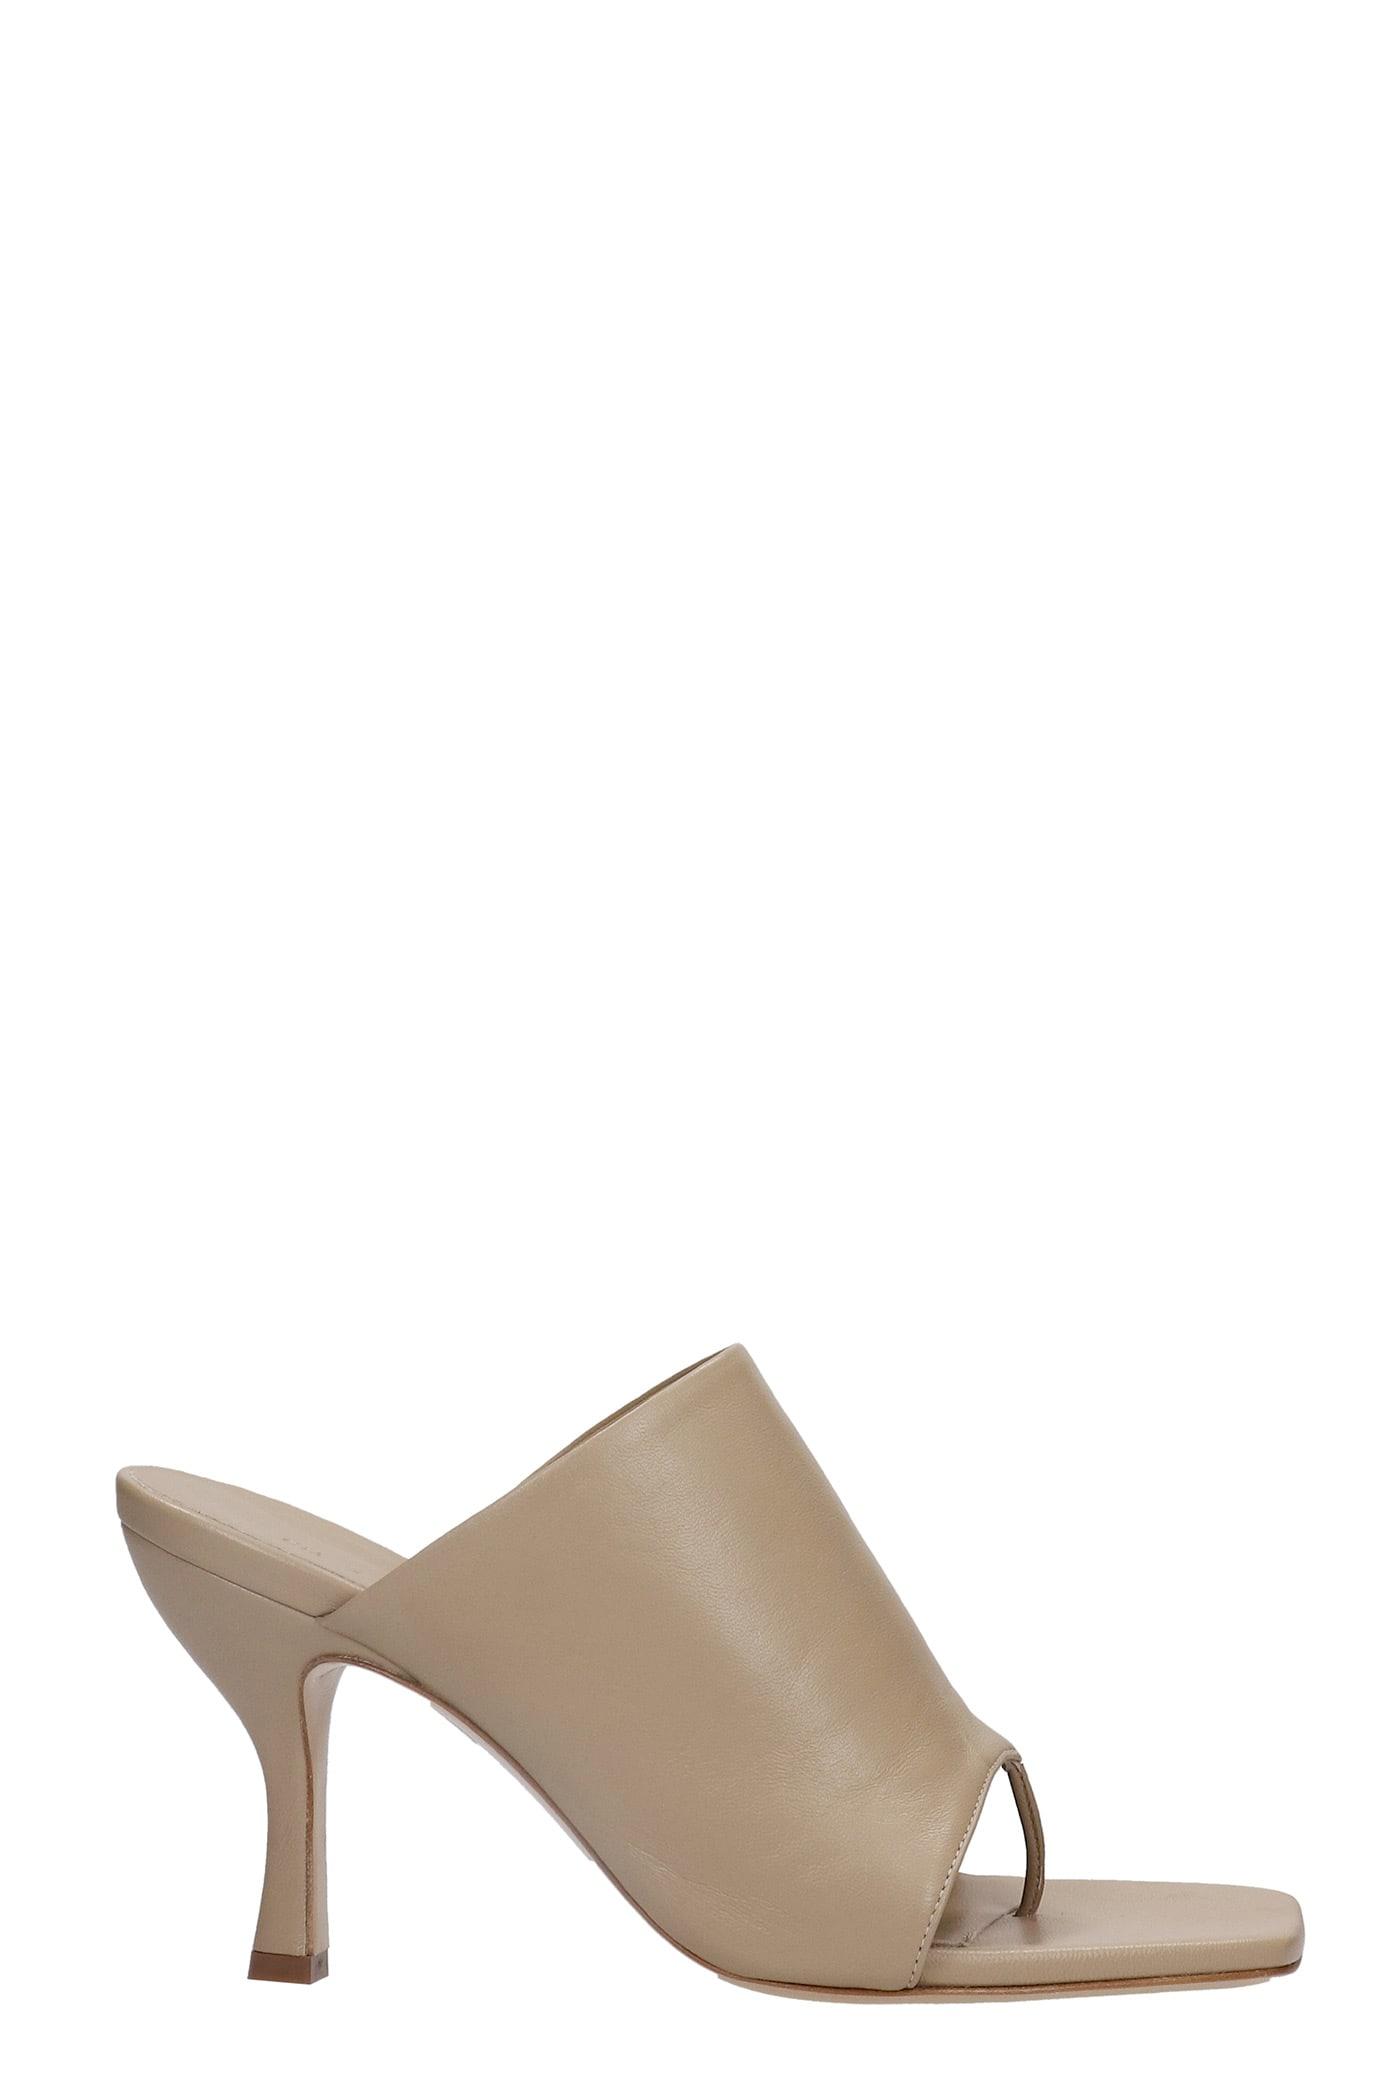 Perni Sandals In Beige Leather